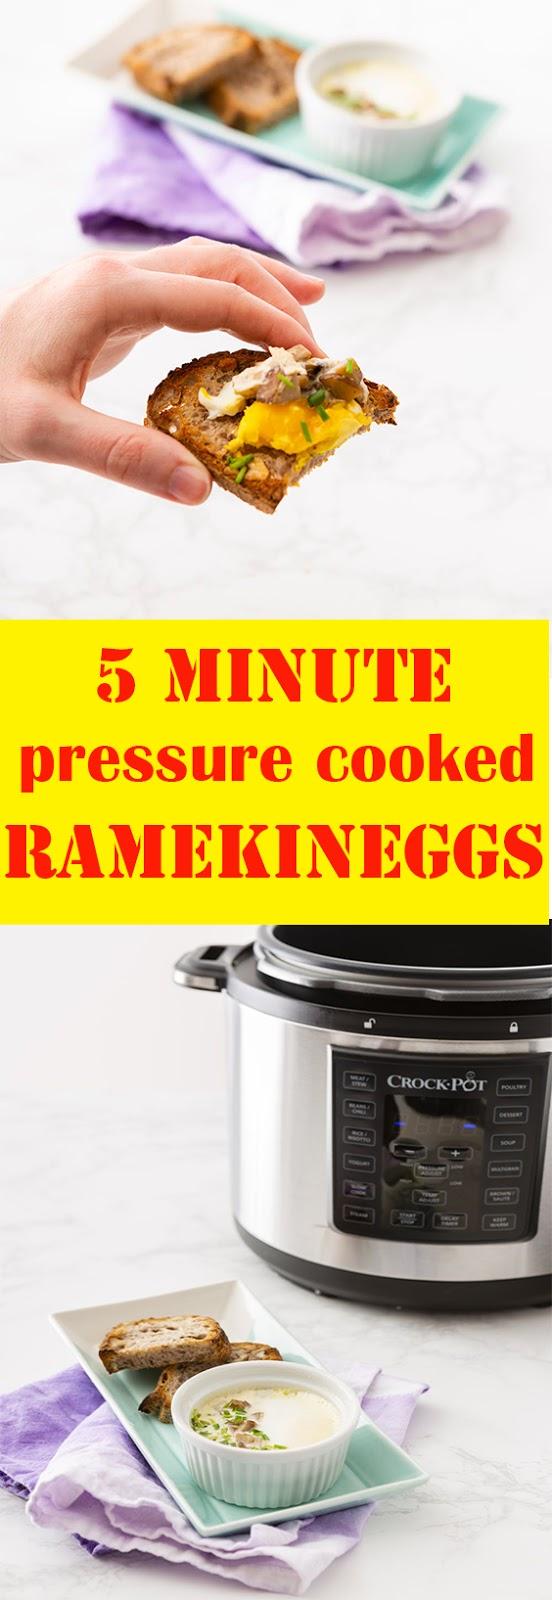 5 minute pressure cooked ramekin eggs